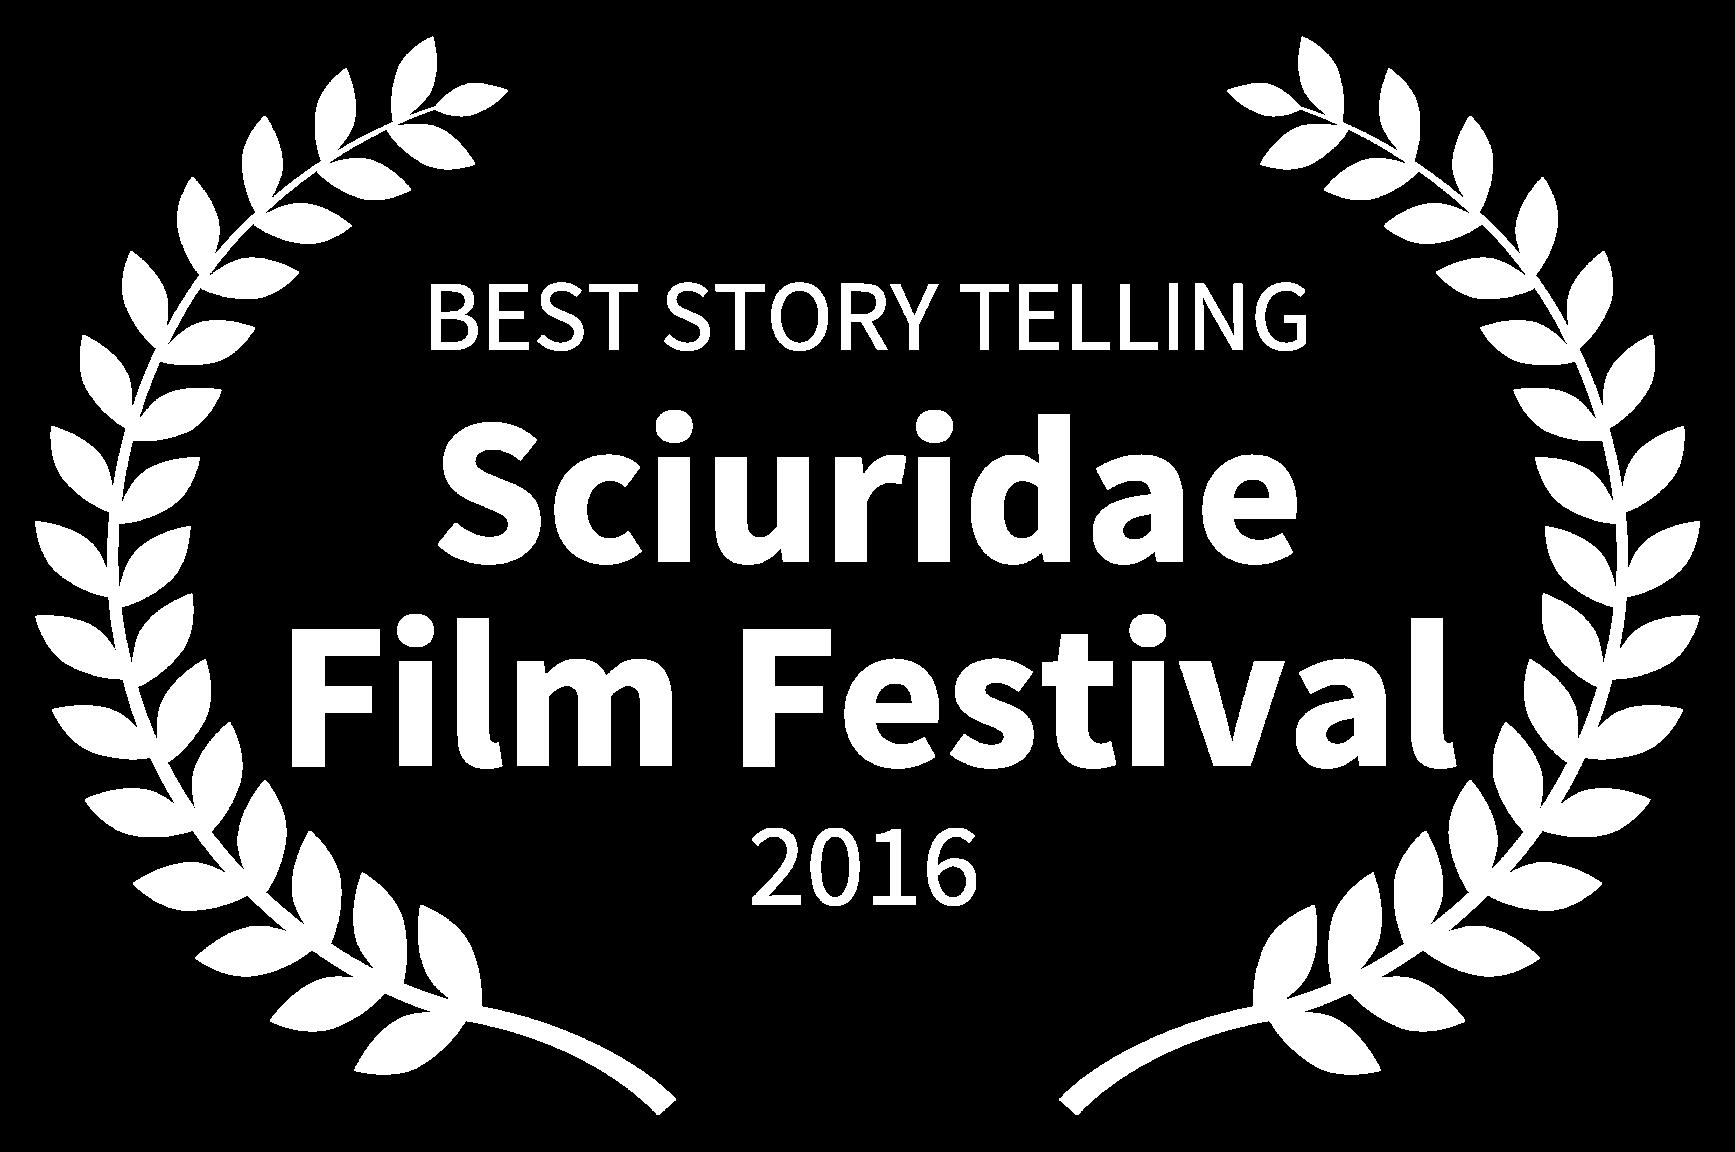 BEST STORY TELLING - Sciuridae Film Festival - 2016